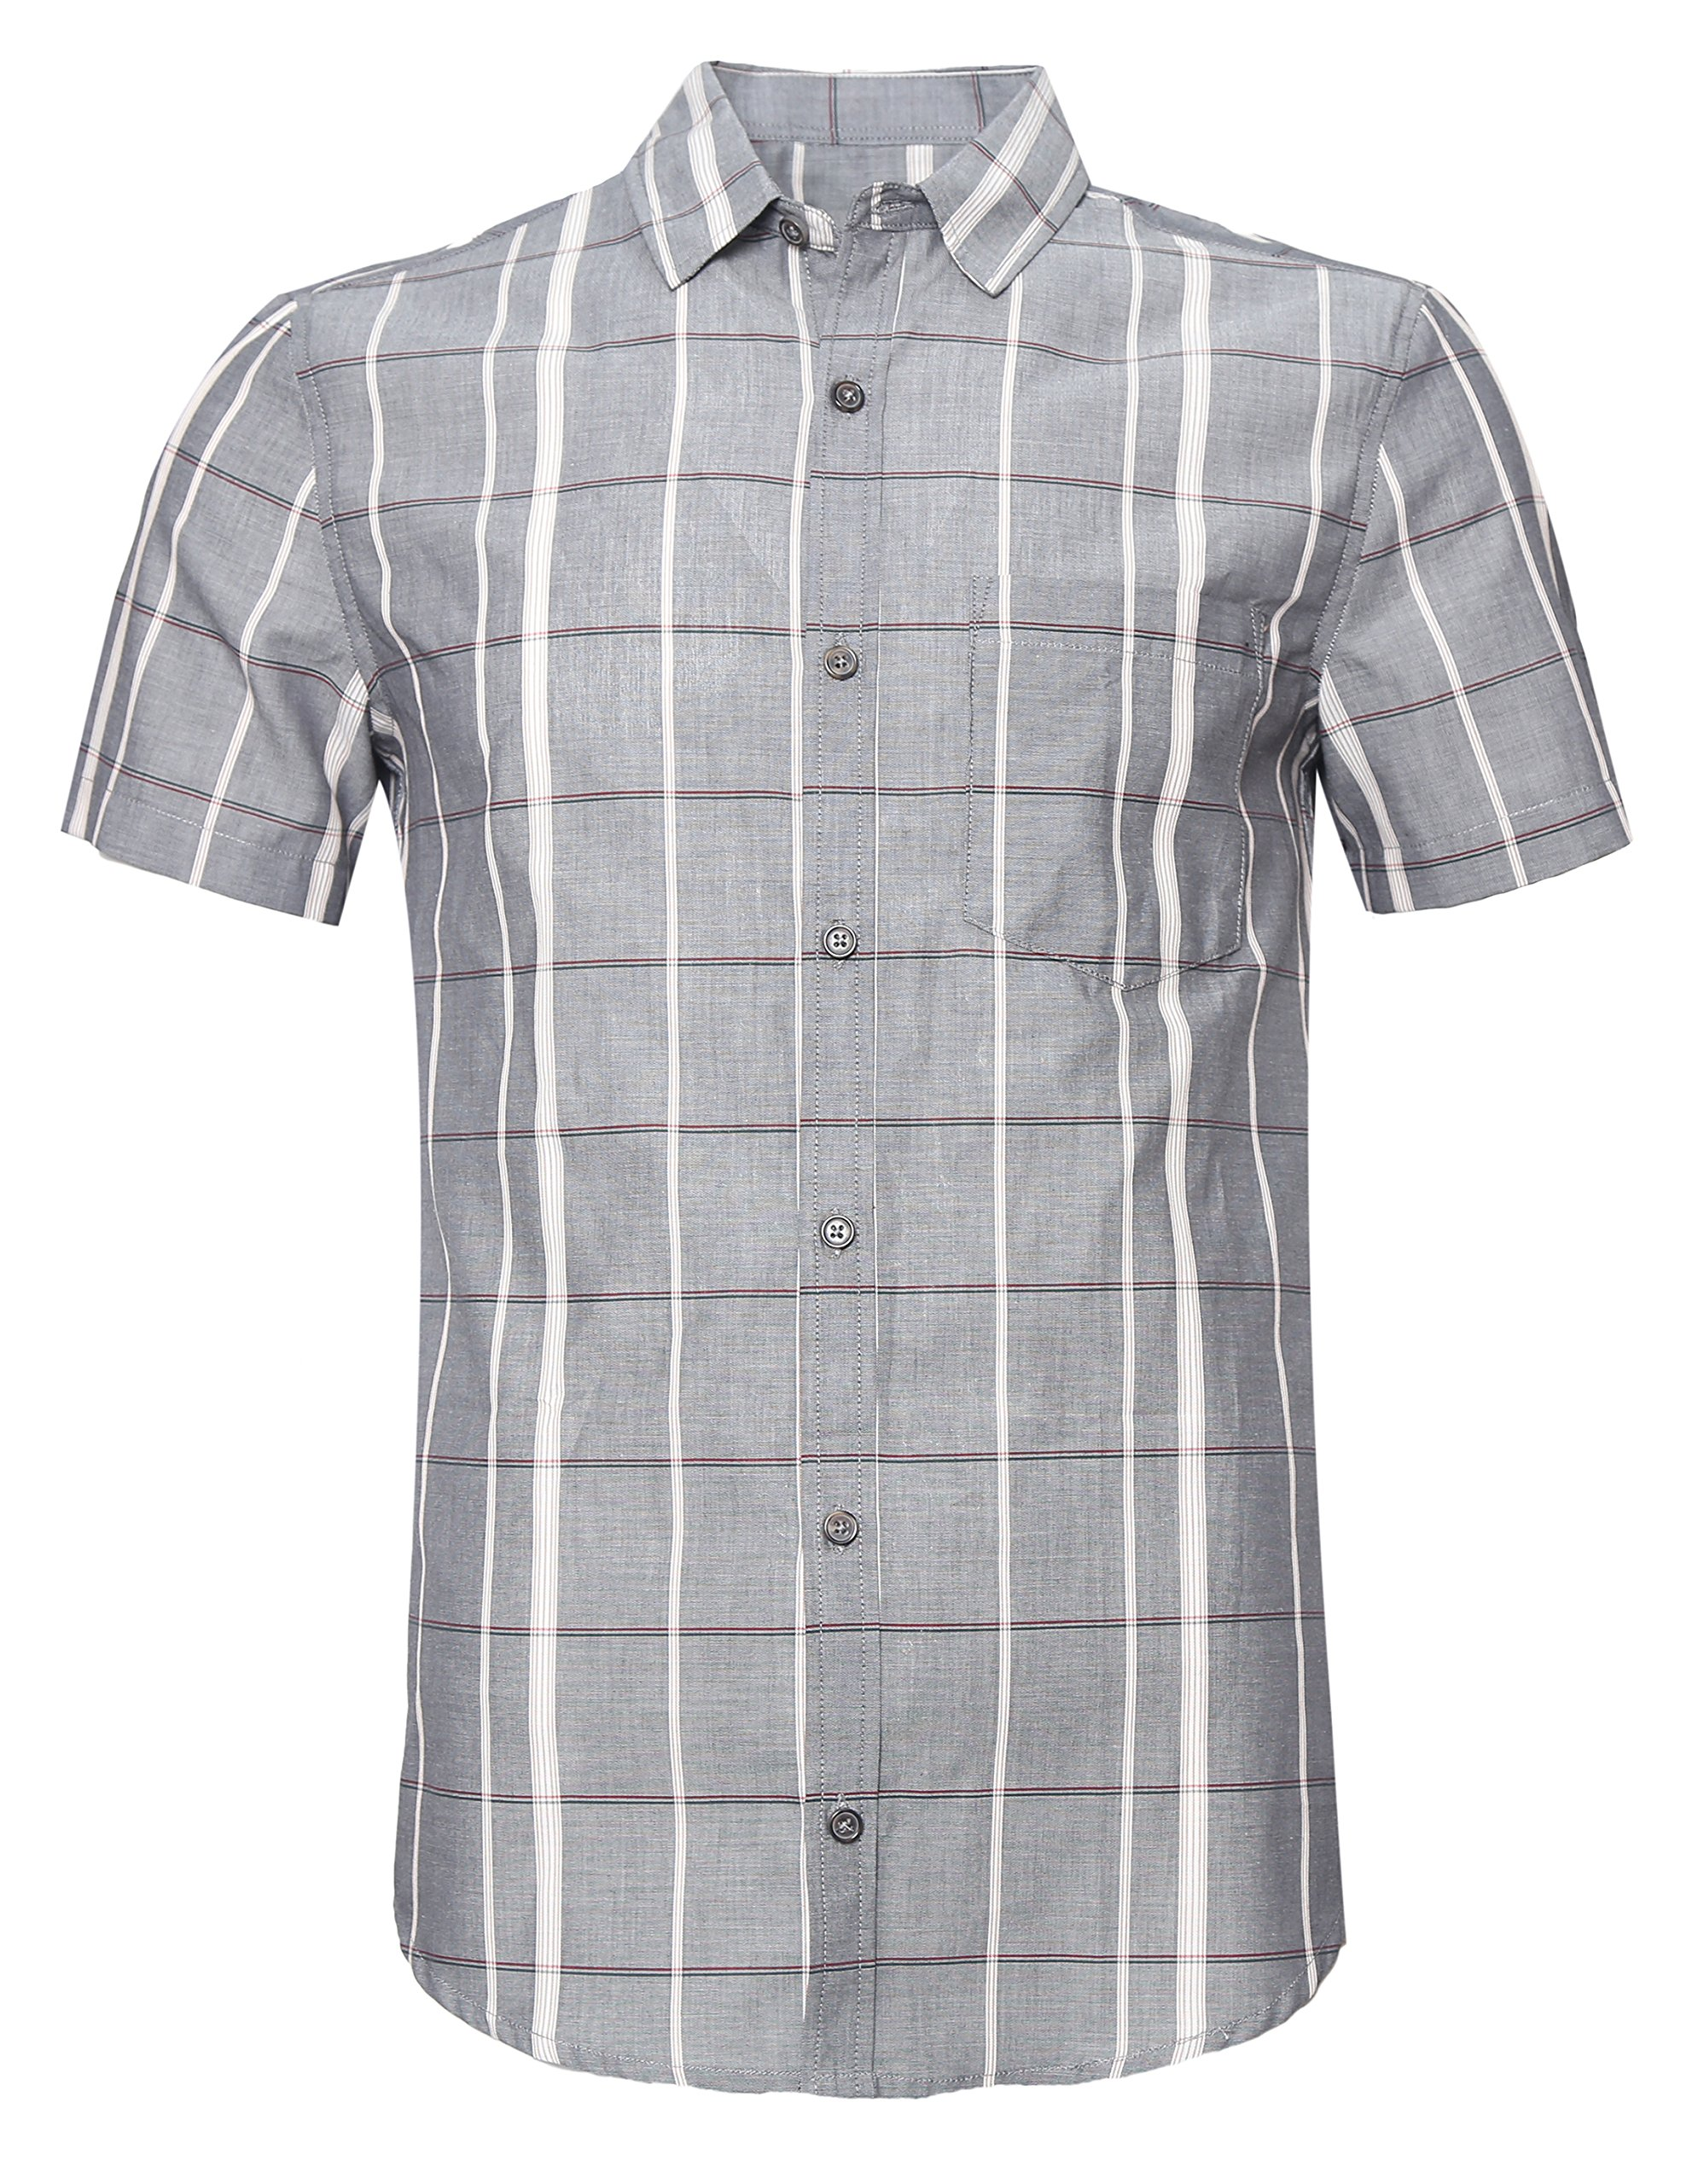 SOOPO Men's Slim-Fit Short Sleeve Plaid Twill Shirt Grey XL